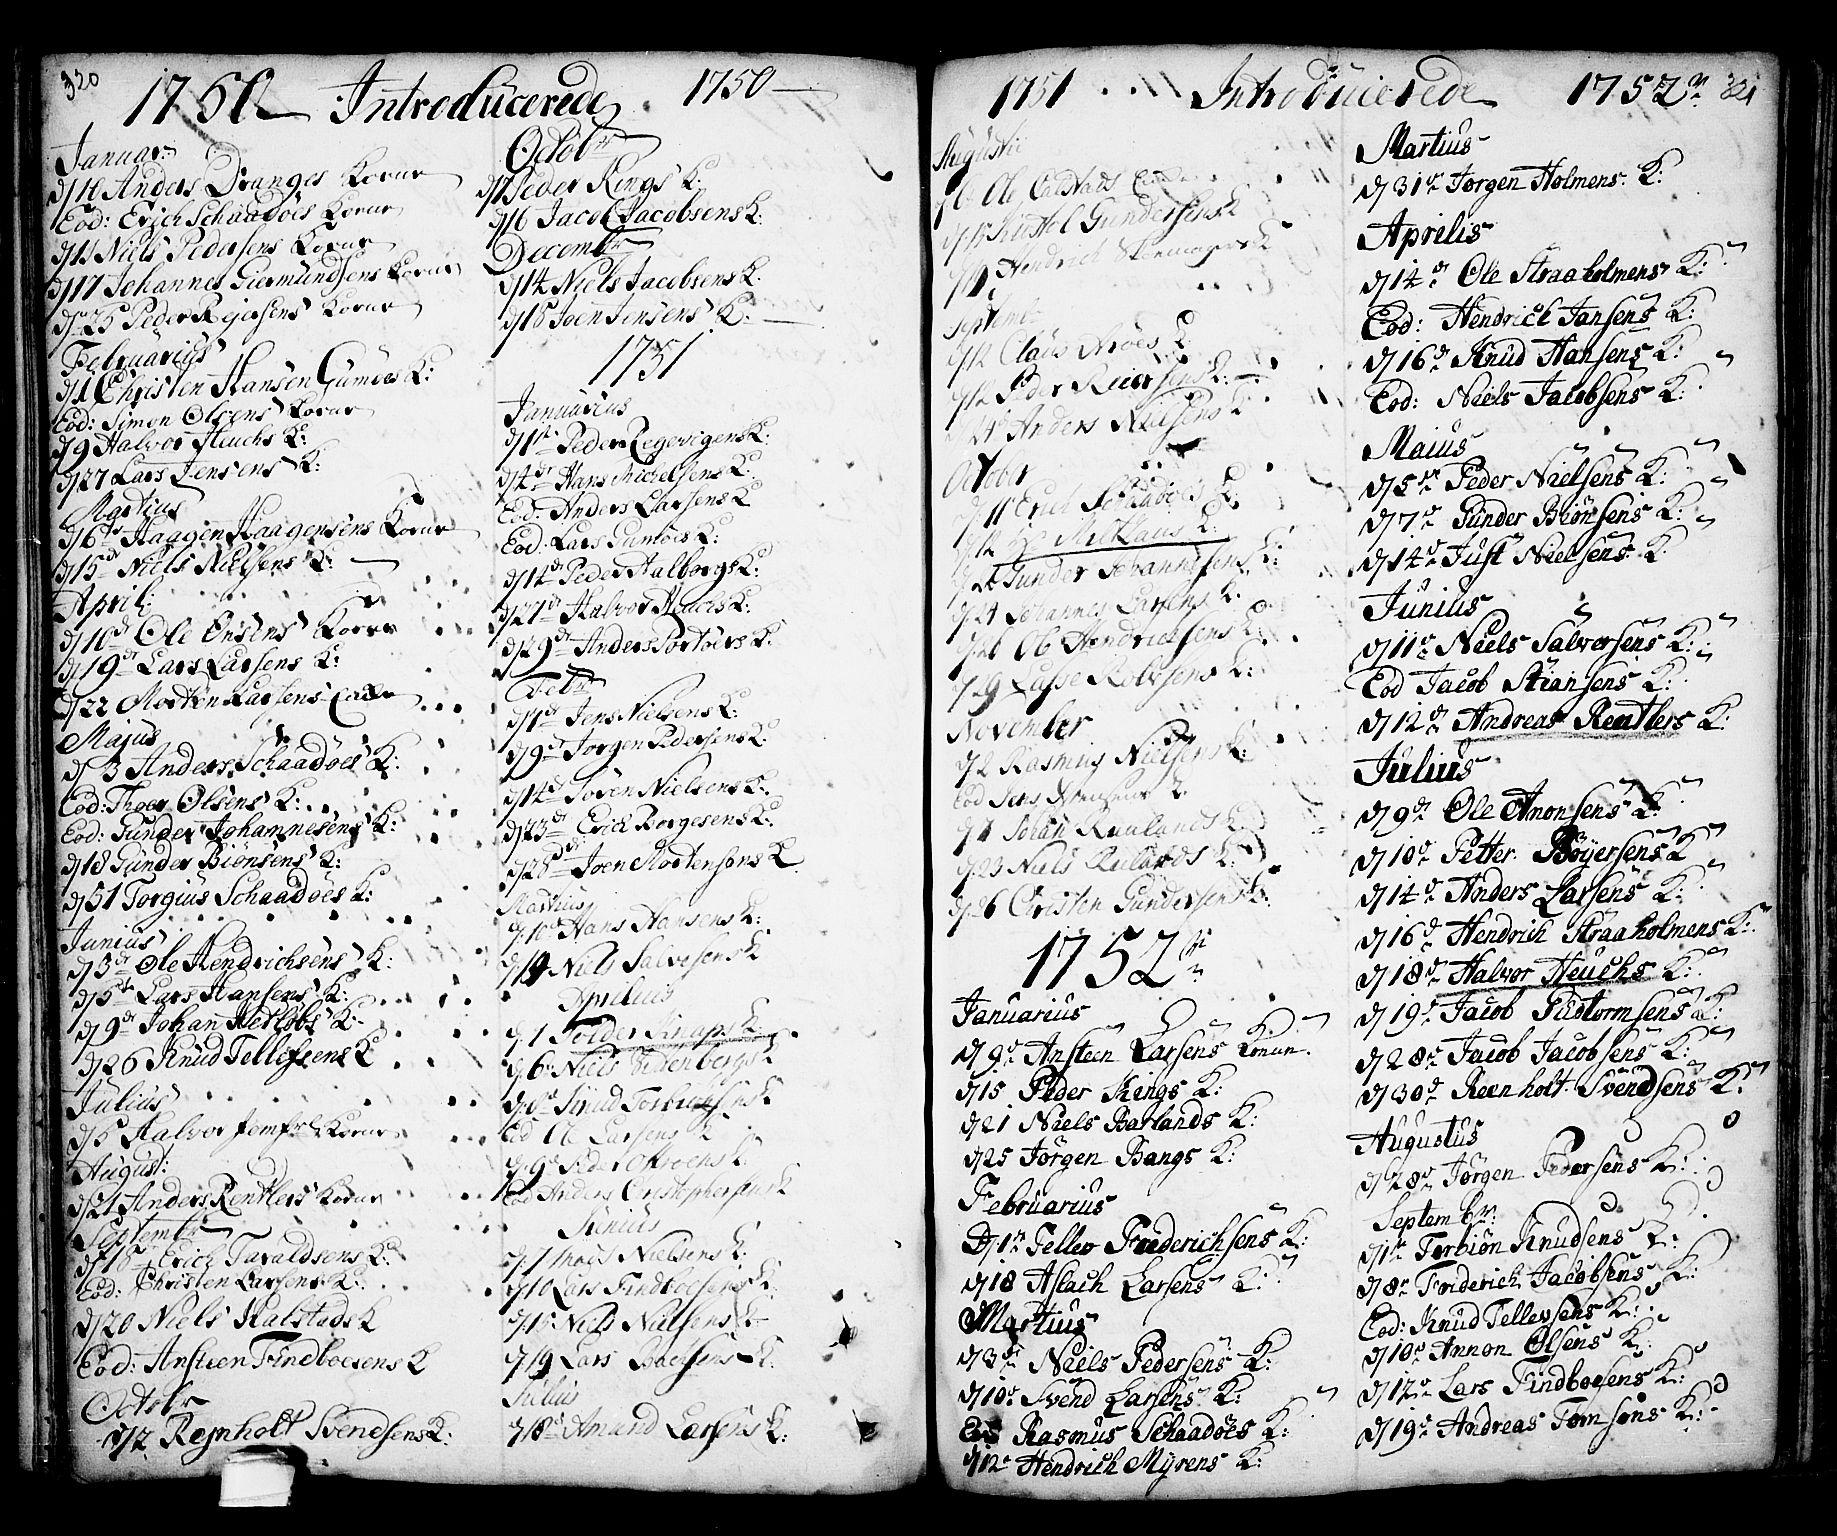 SAKO, Kragerø kirkebøker, F/Fa/L0001: Ministerialbok nr. 1, 1702-1766, s. 320-321